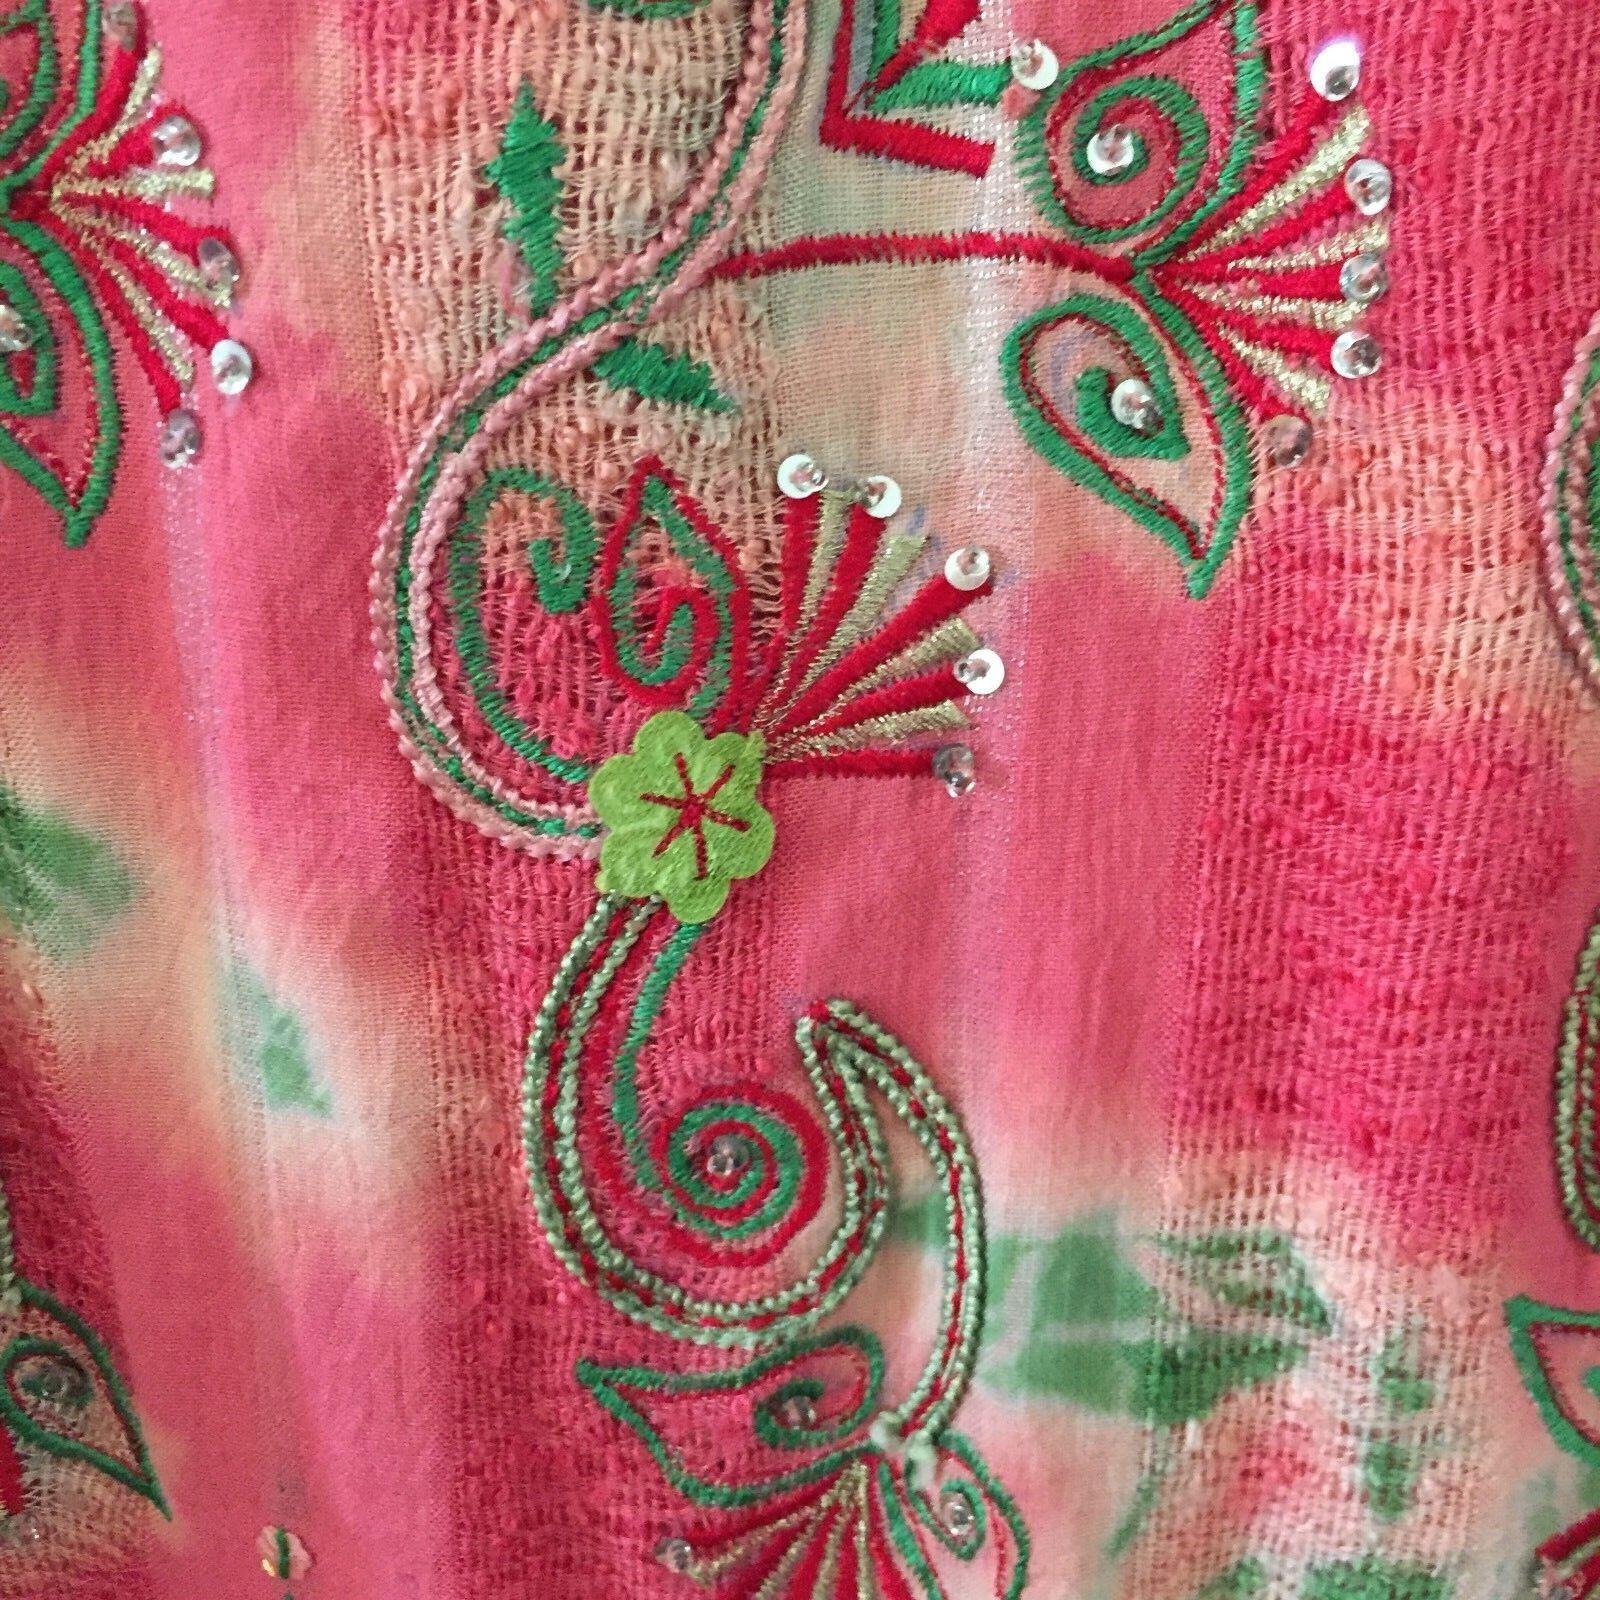 Vintage Authentic Indian Maxi Dress Embroidery Crochet Hippy Boho Women's S